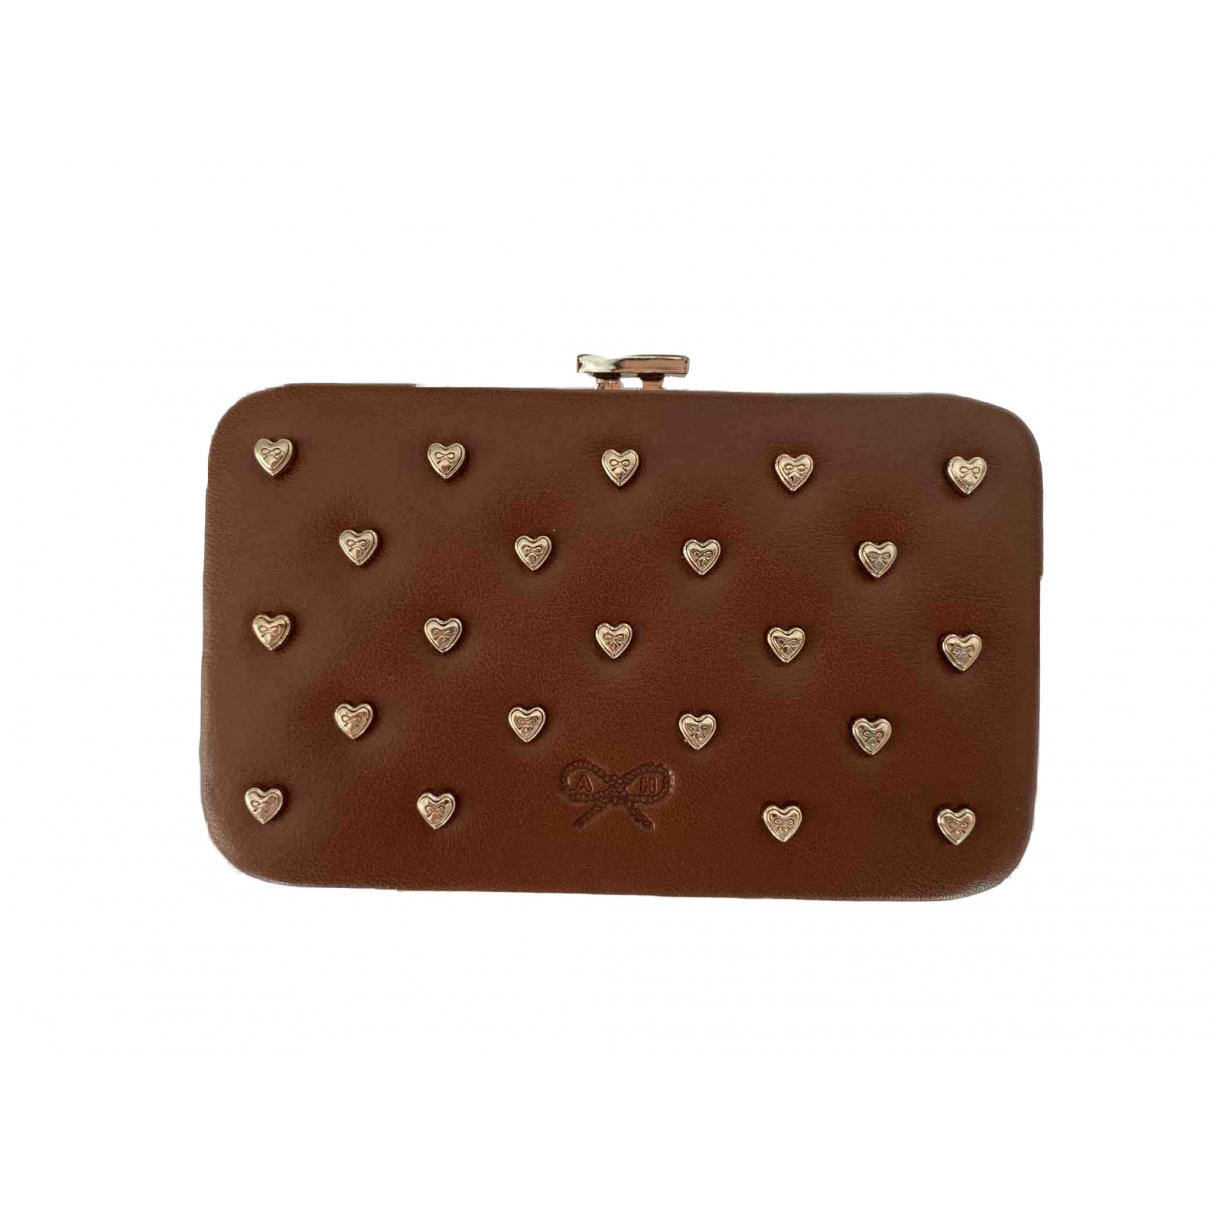 Anya Hindmarch \N Brown Leather wallet for Women \N